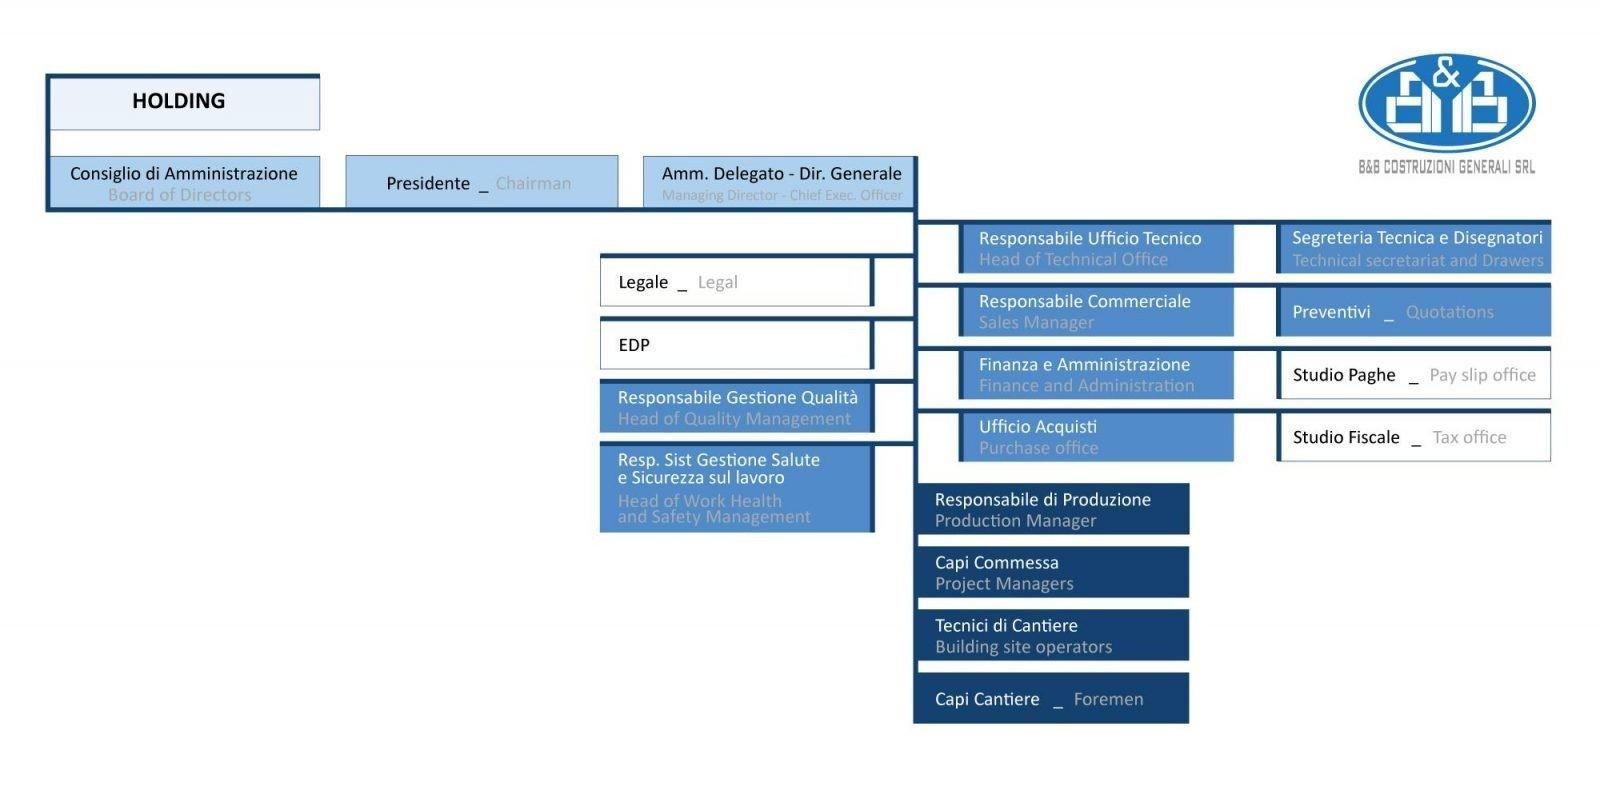 organigramma-bb-costruzioni-generali